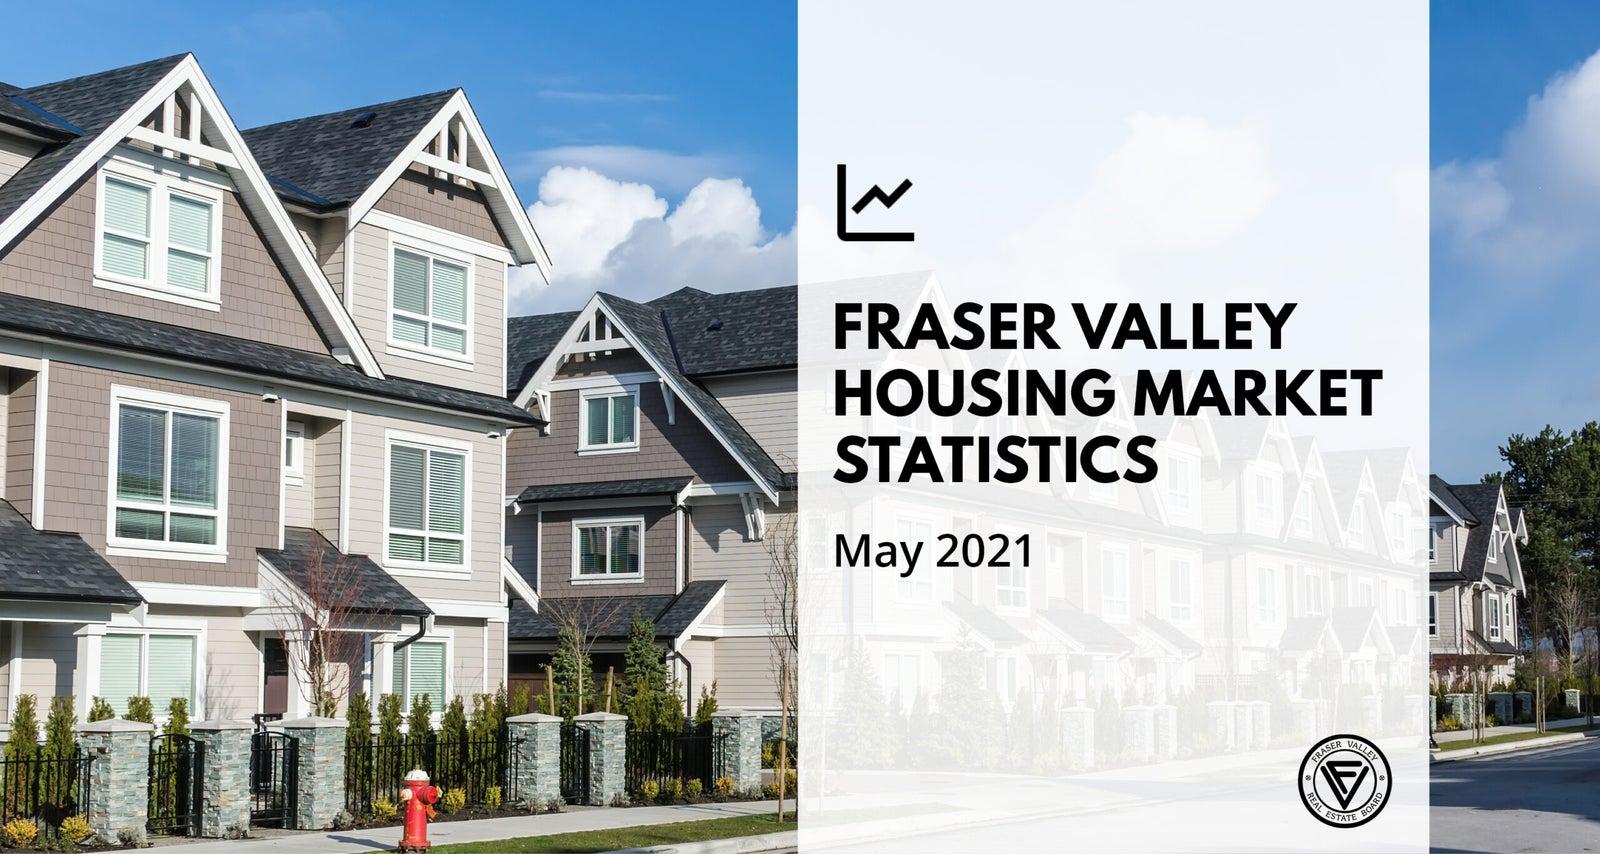 Fraser Valley Housing Market Statistics for May 2021